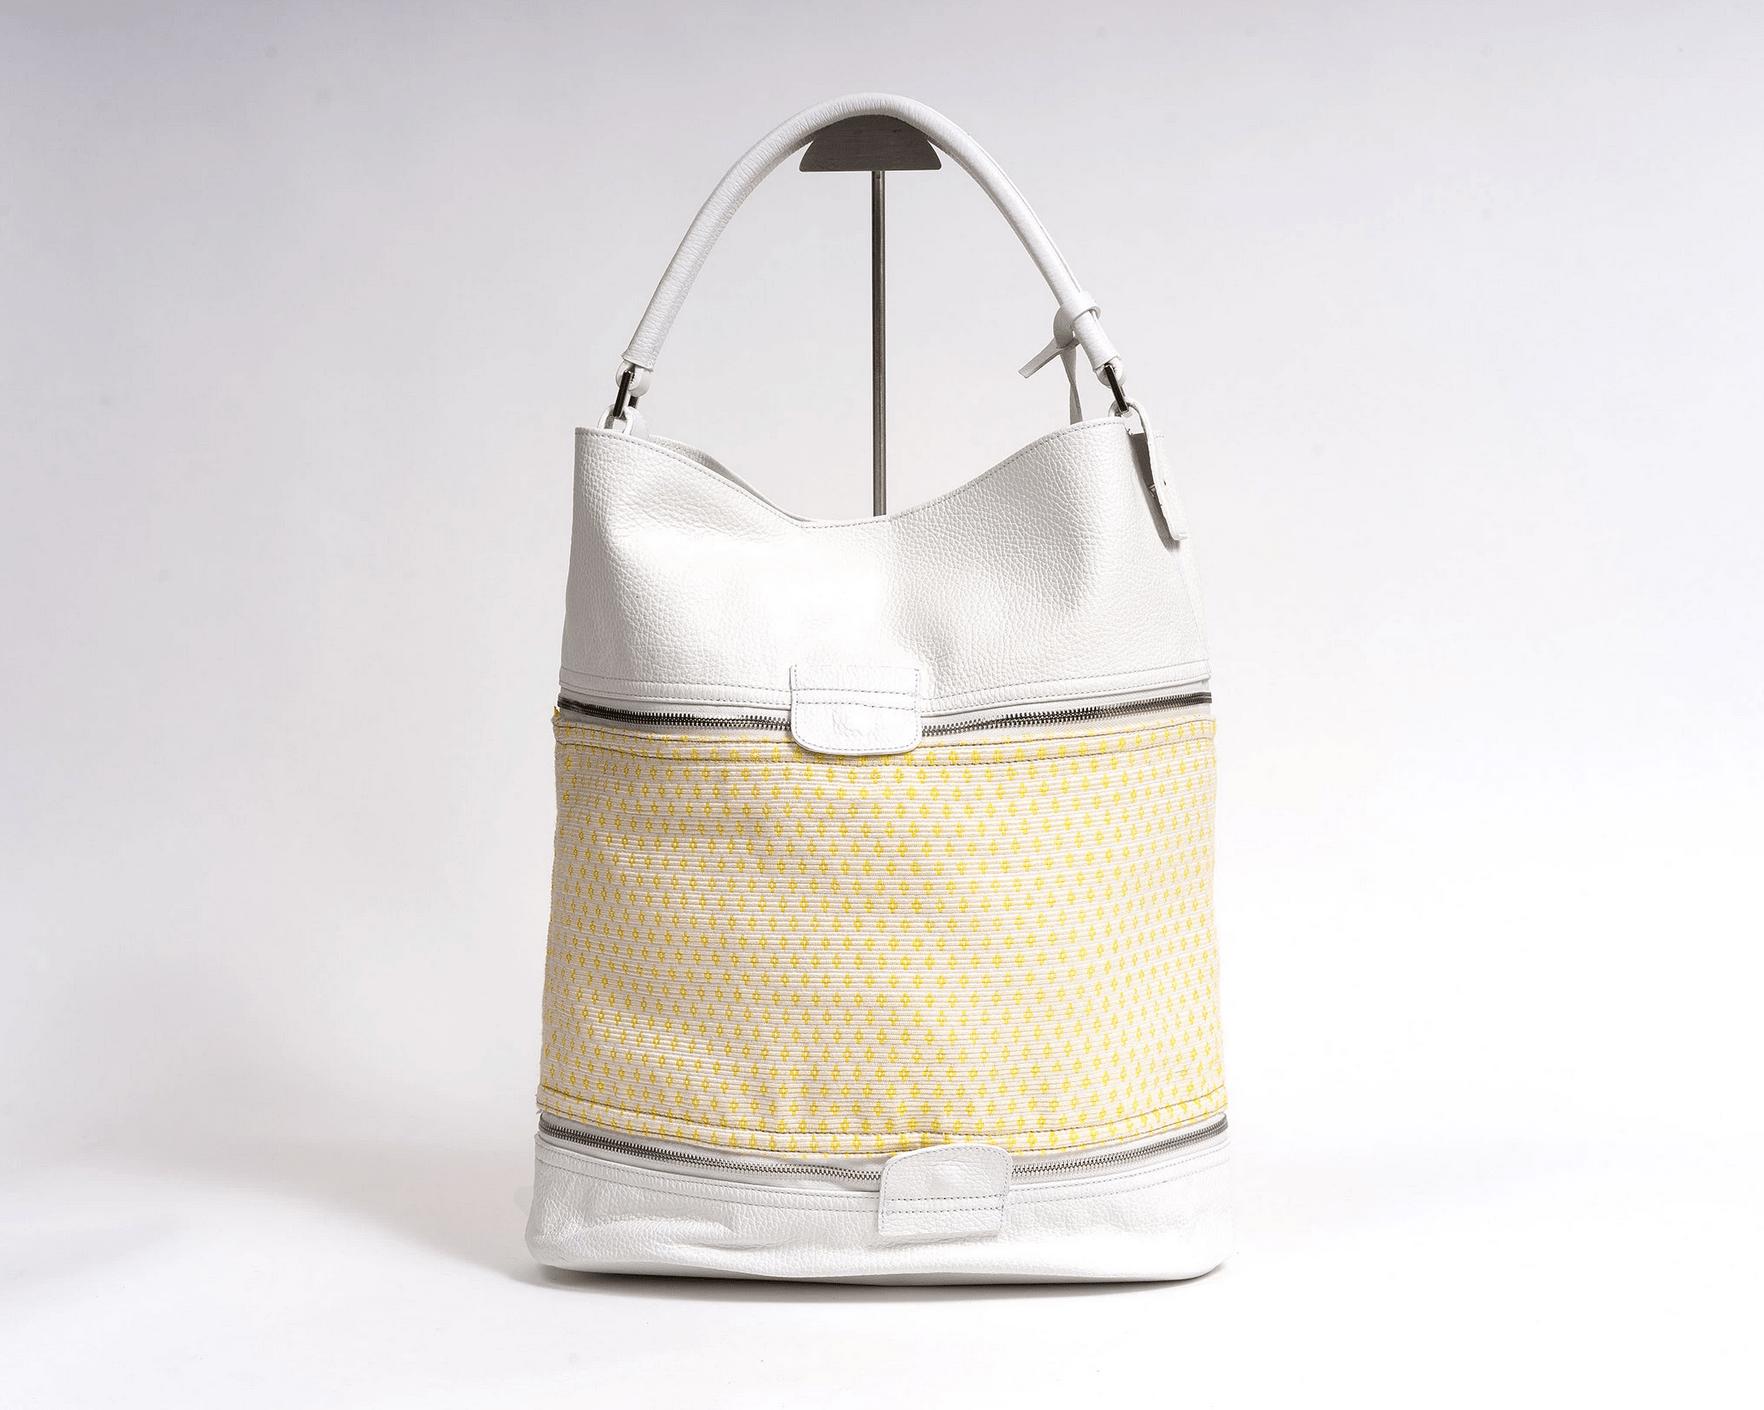 PBG-PARIS-Bags of Hope Bucket bag large, white